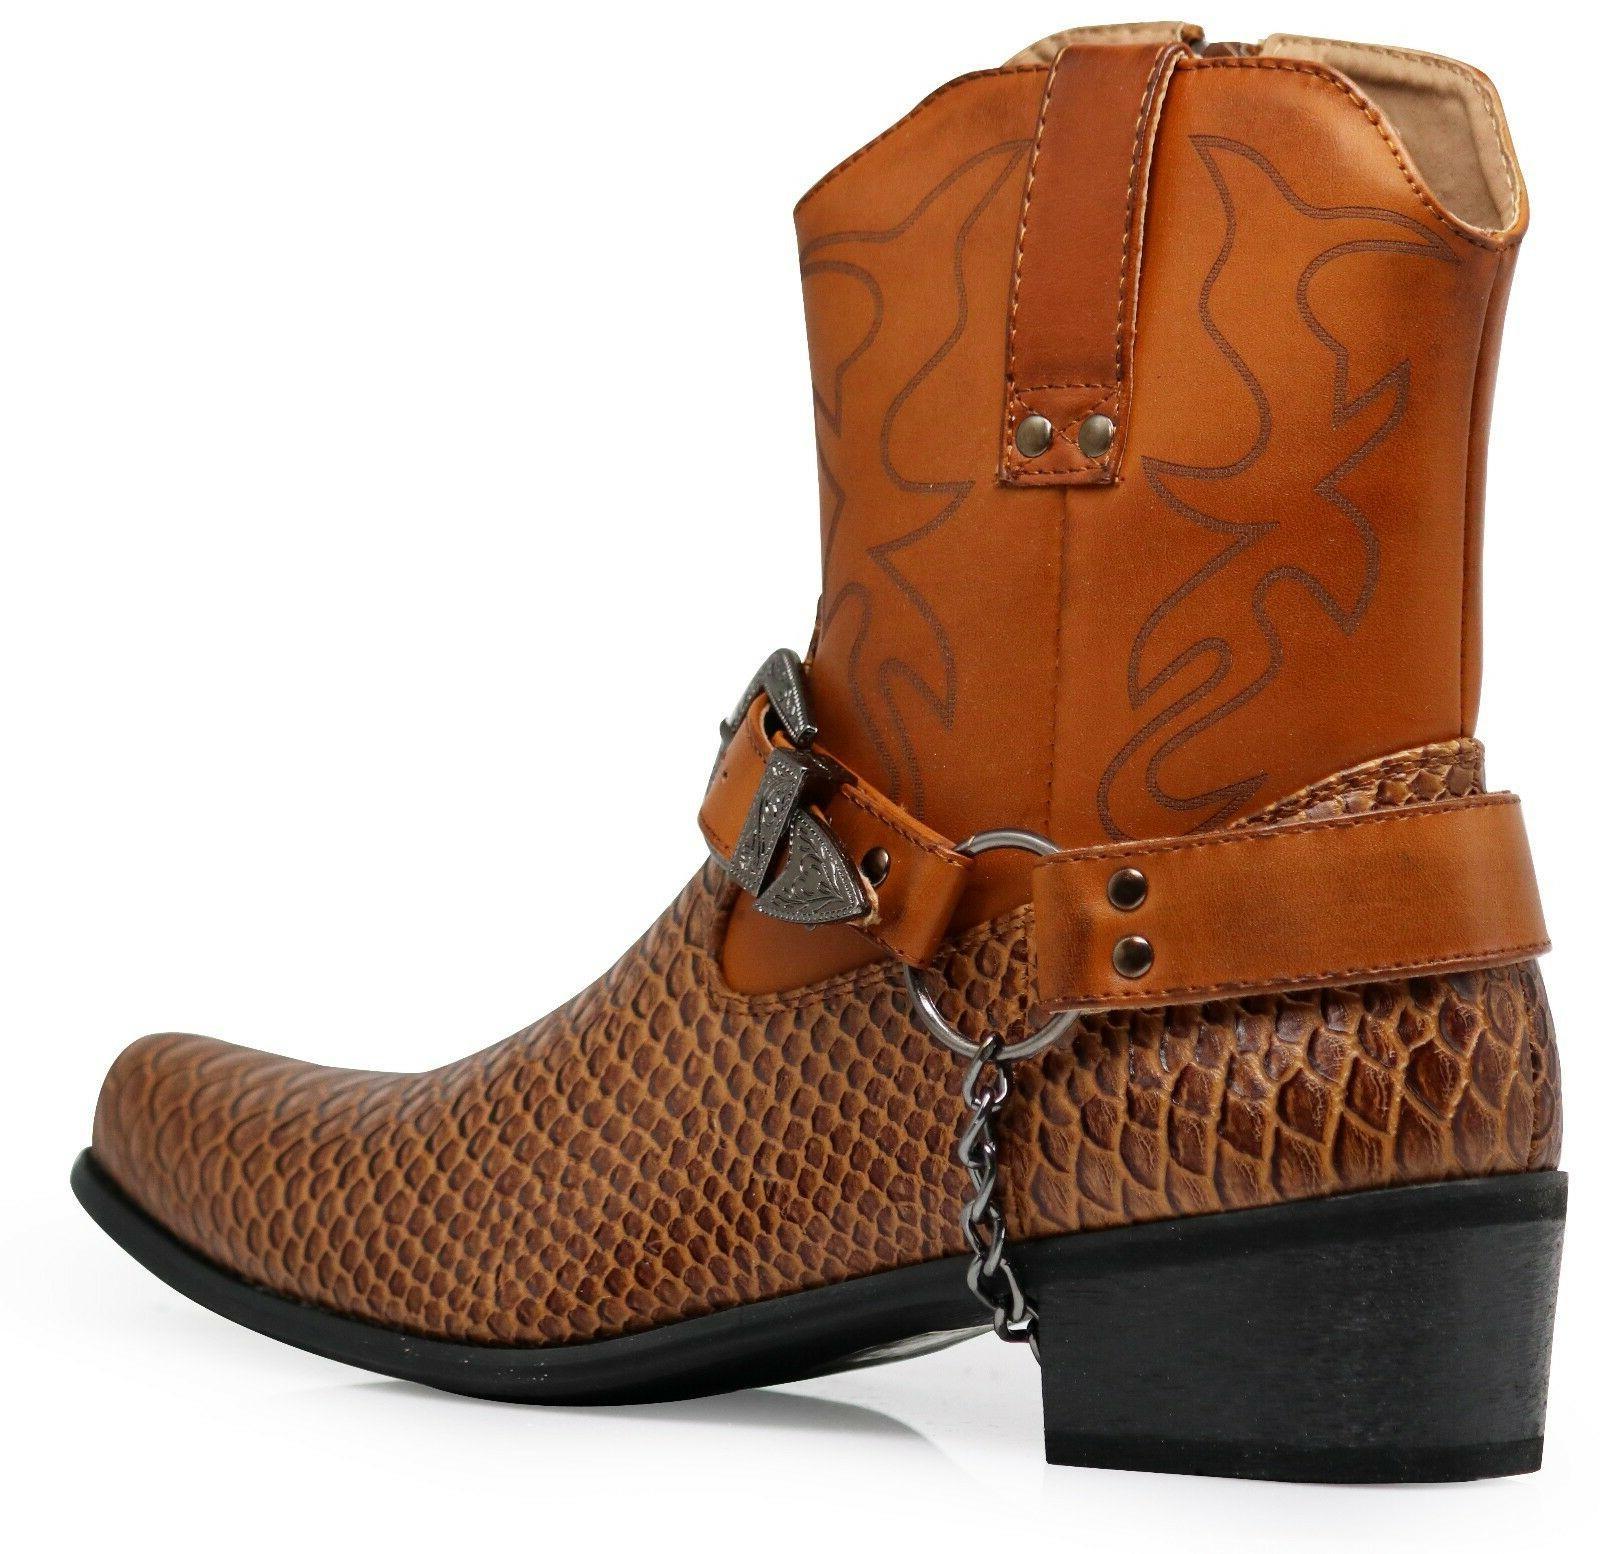 Men Cowboy Boots Shoes Leather Motorcycle Crocodile